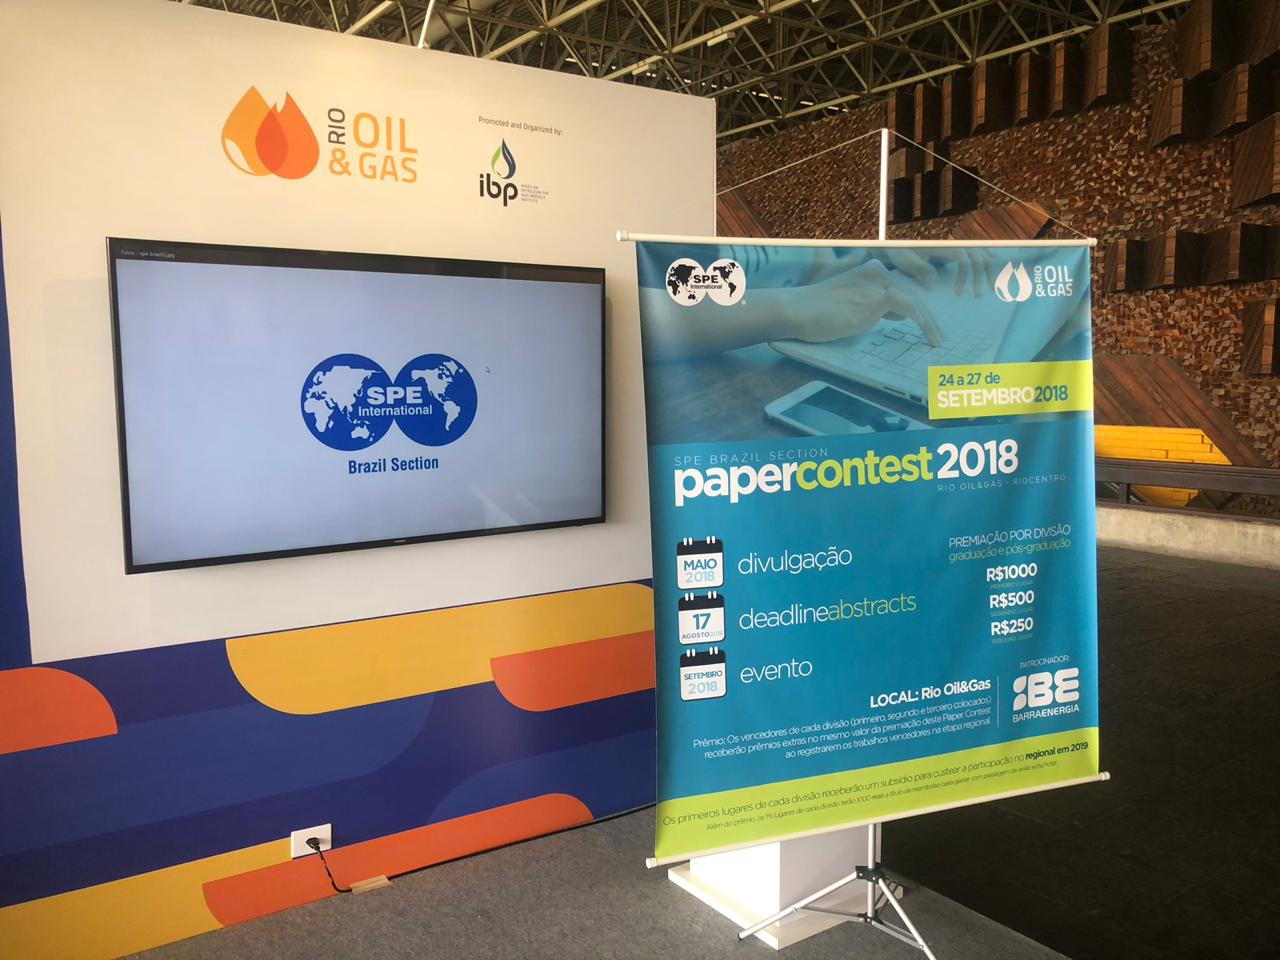 Realizado: SPE Brazil Student Paper Contest 2018